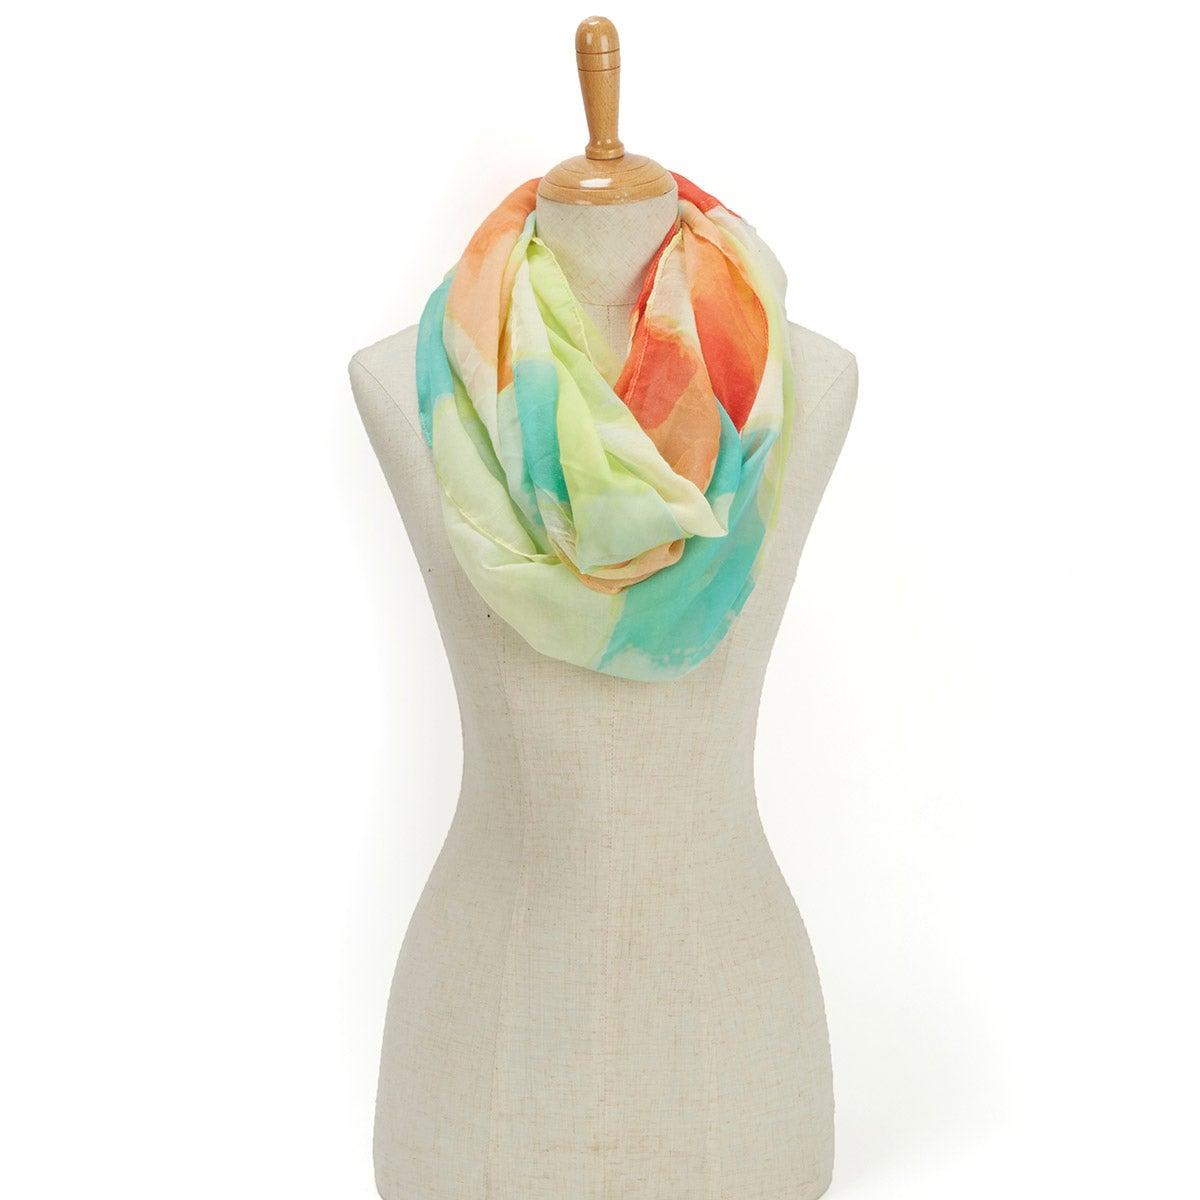 Lds Paradise Lost Swirl Loop lemon scarf